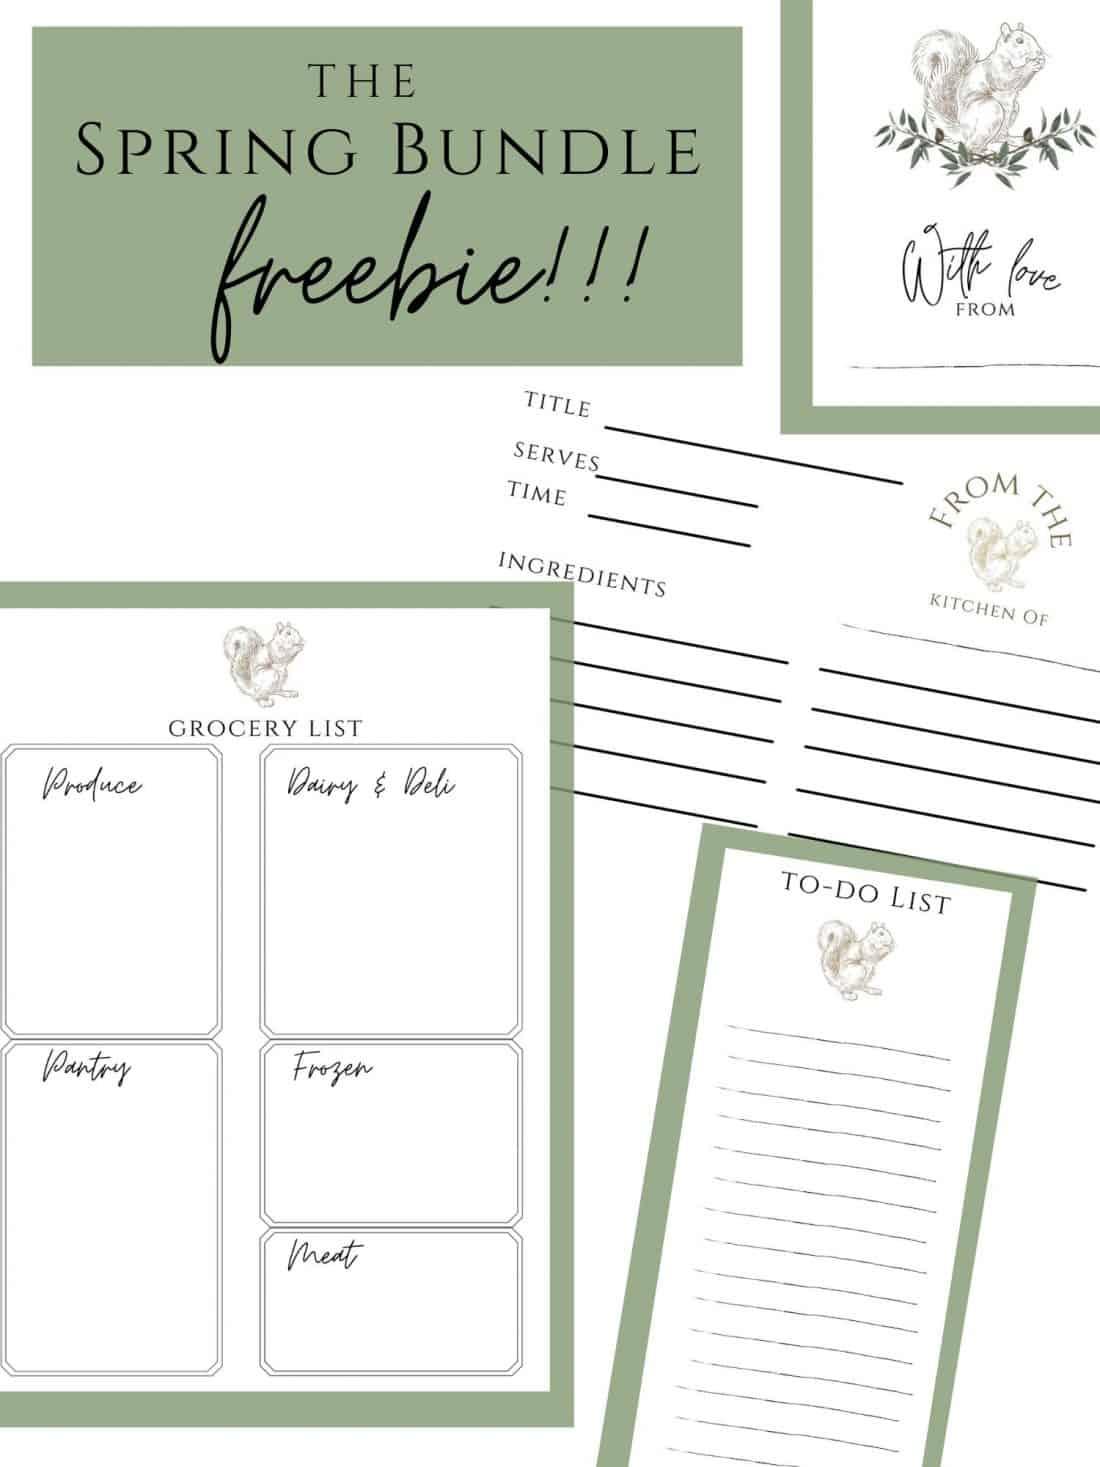 spring bundle freebies for the homemaker